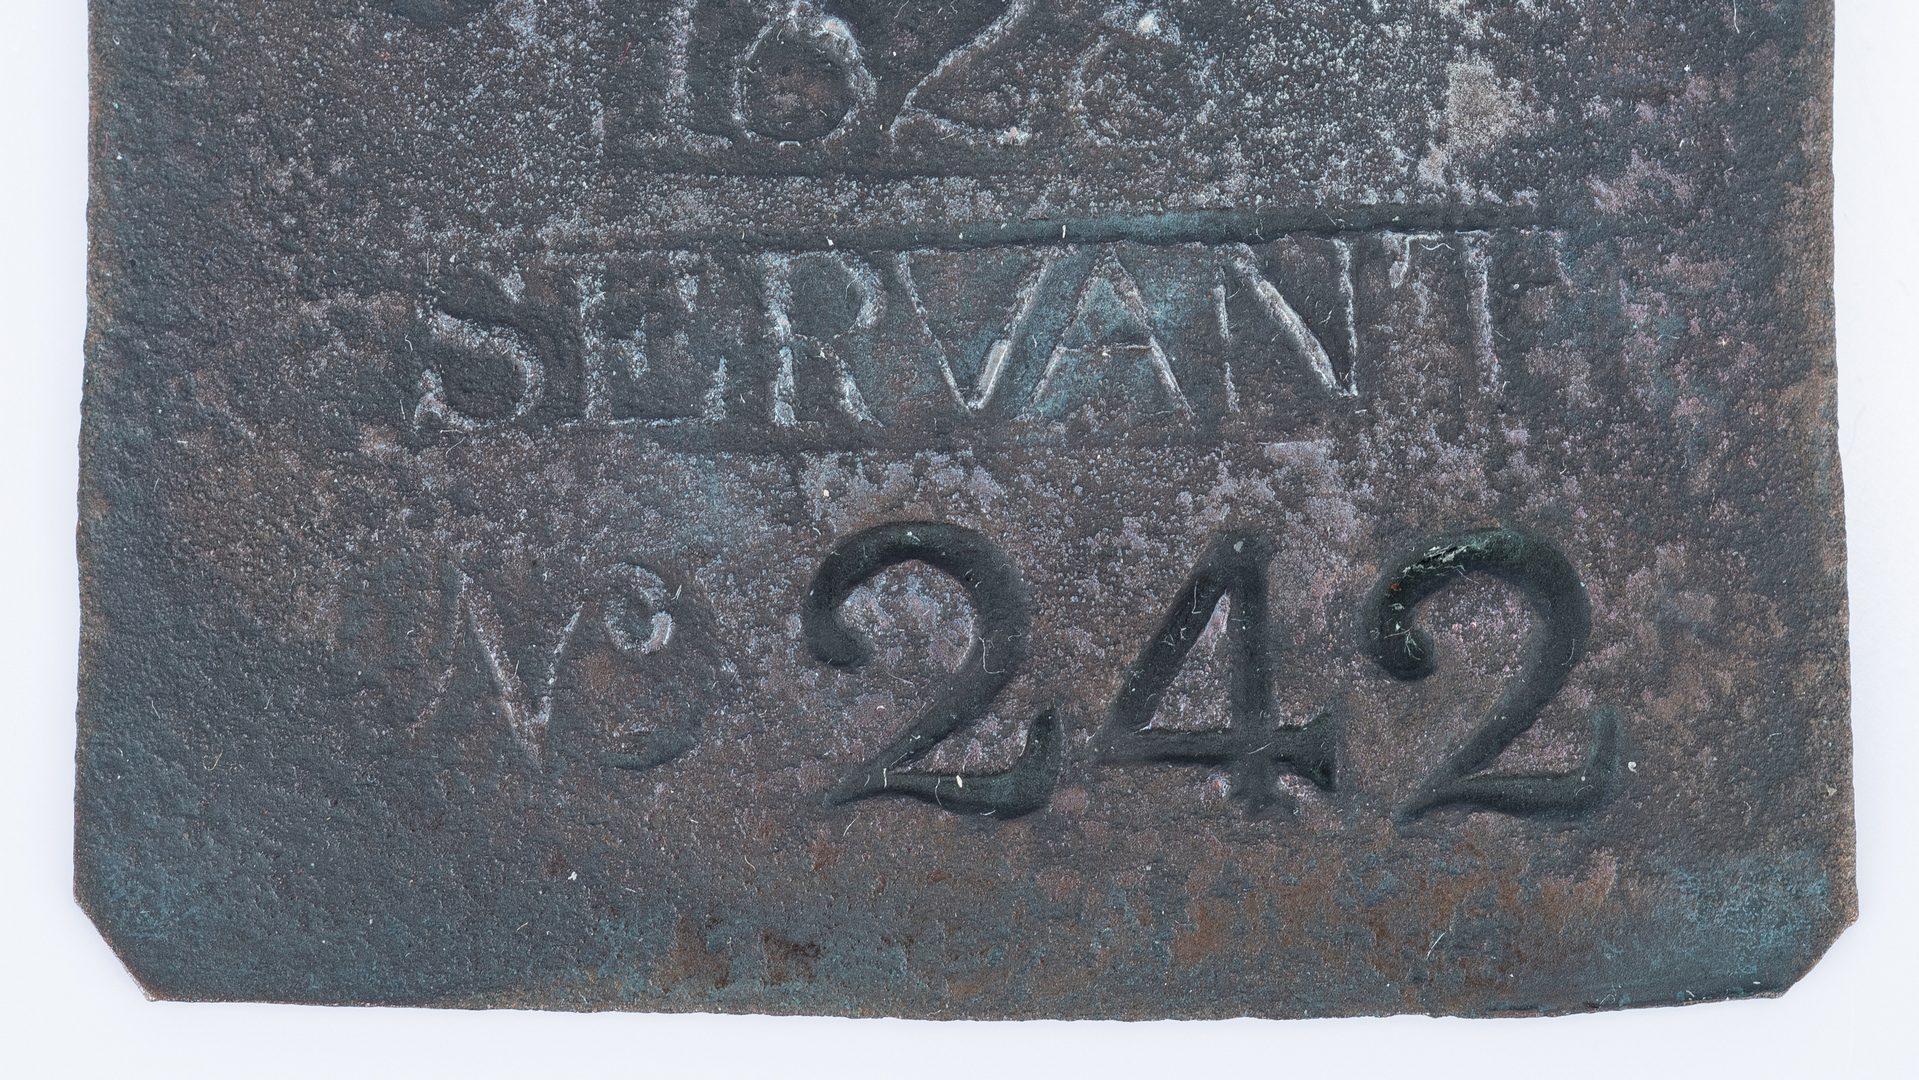 Lot 336: 1828 Charleston Lafar Servant Slave Hire Badge, Number 242